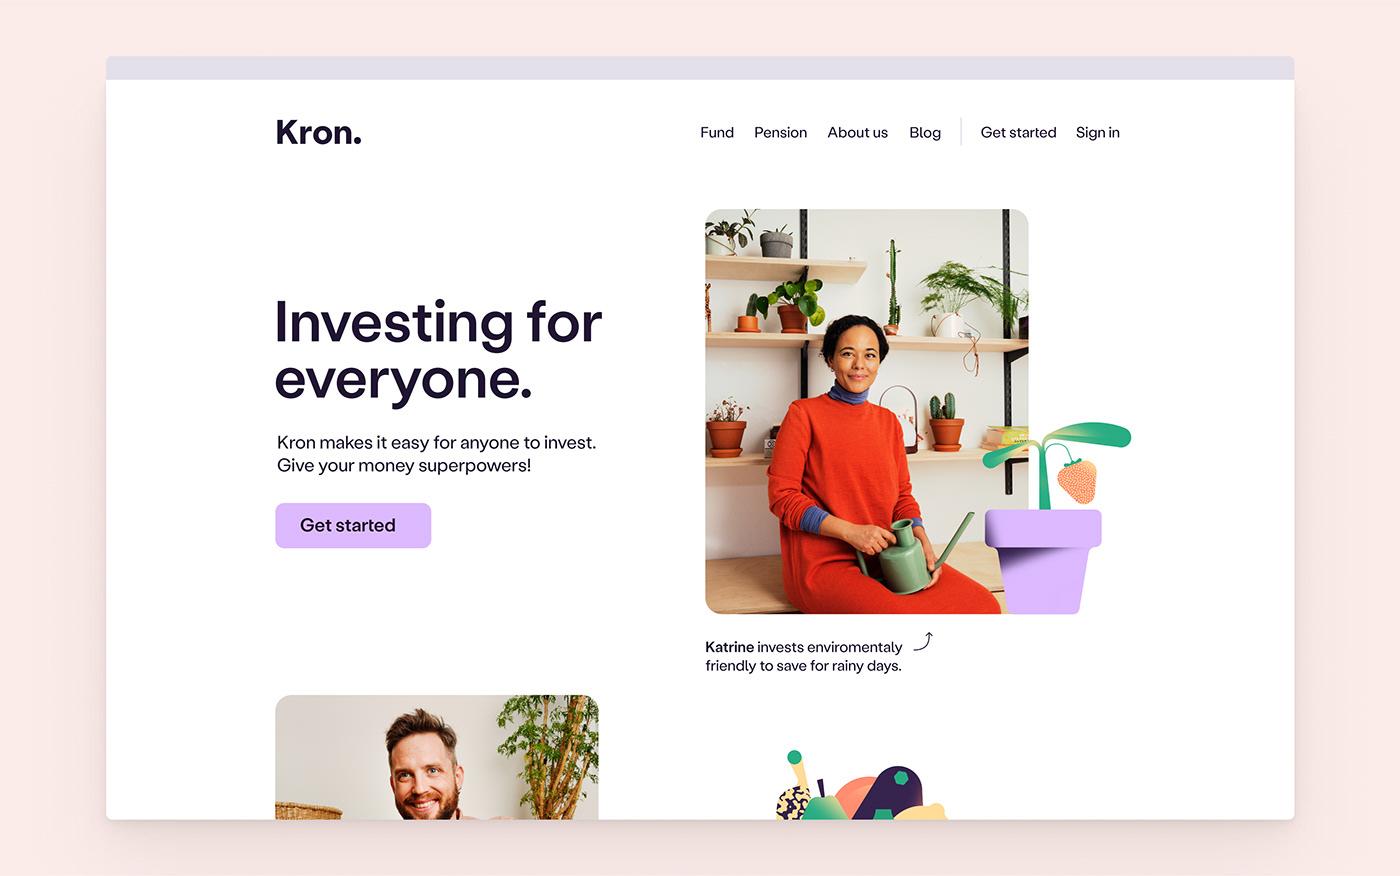 app,branding ,Fintech,graphic design ,Investment,norway,finance,ILLUSTRATION ,money